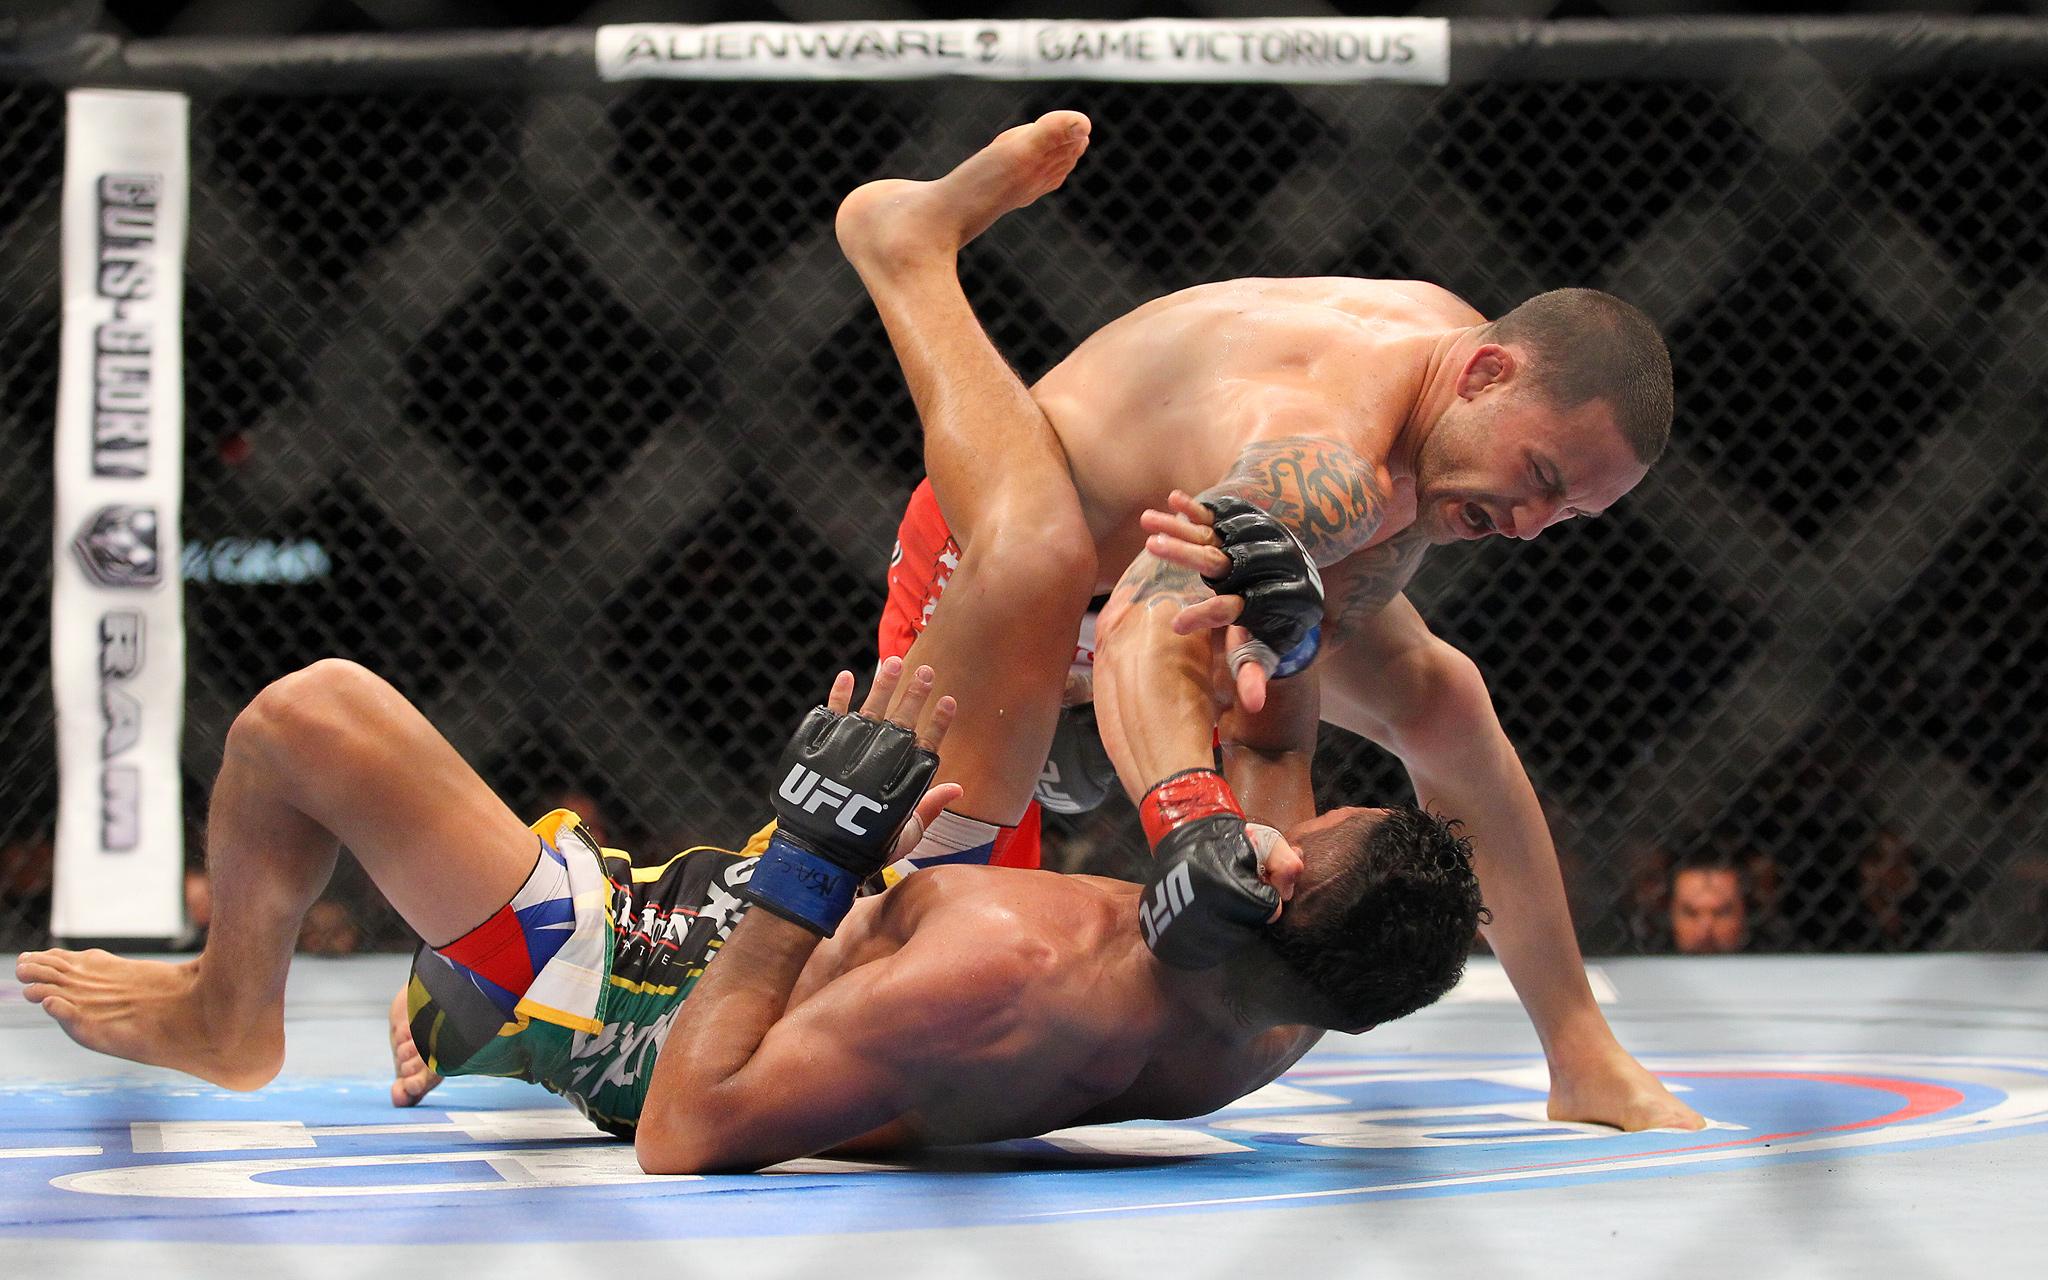 Frankie Edgar takes down Charles Oliveira